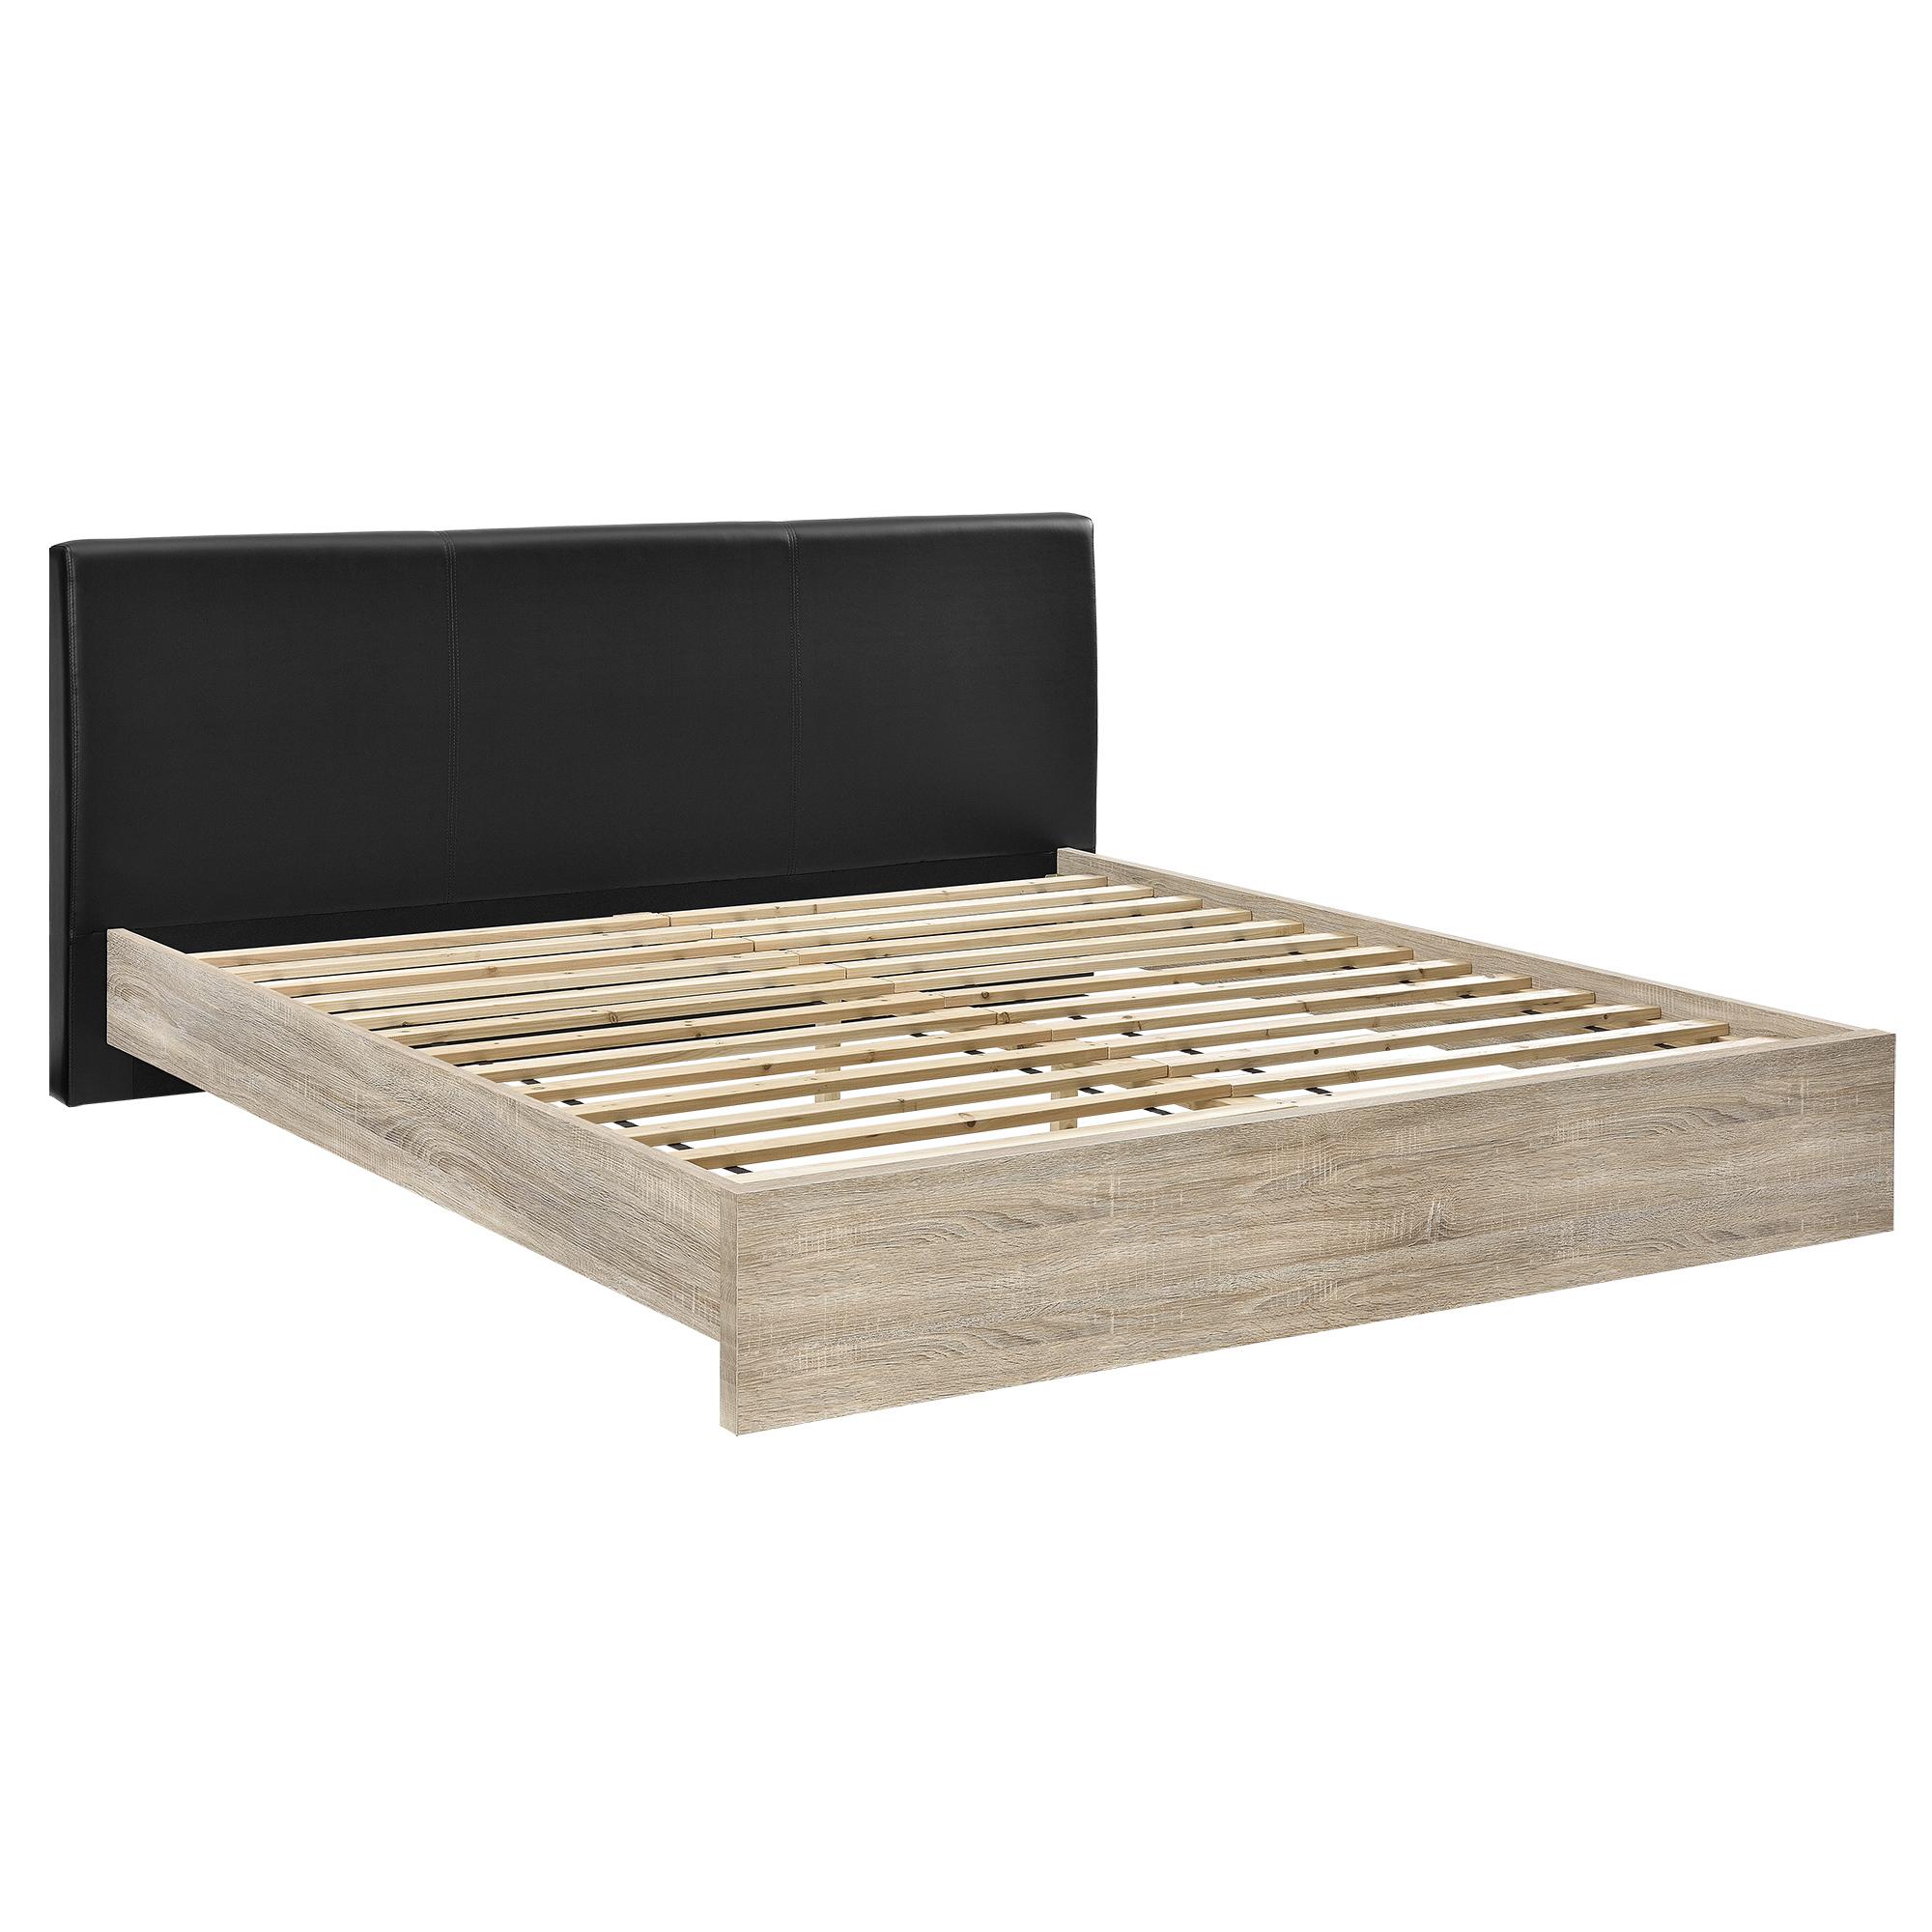 sommier tapissier design 180x200cm bois double lit sommier simili cuir ebay. Black Bedroom Furniture Sets. Home Design Ideas